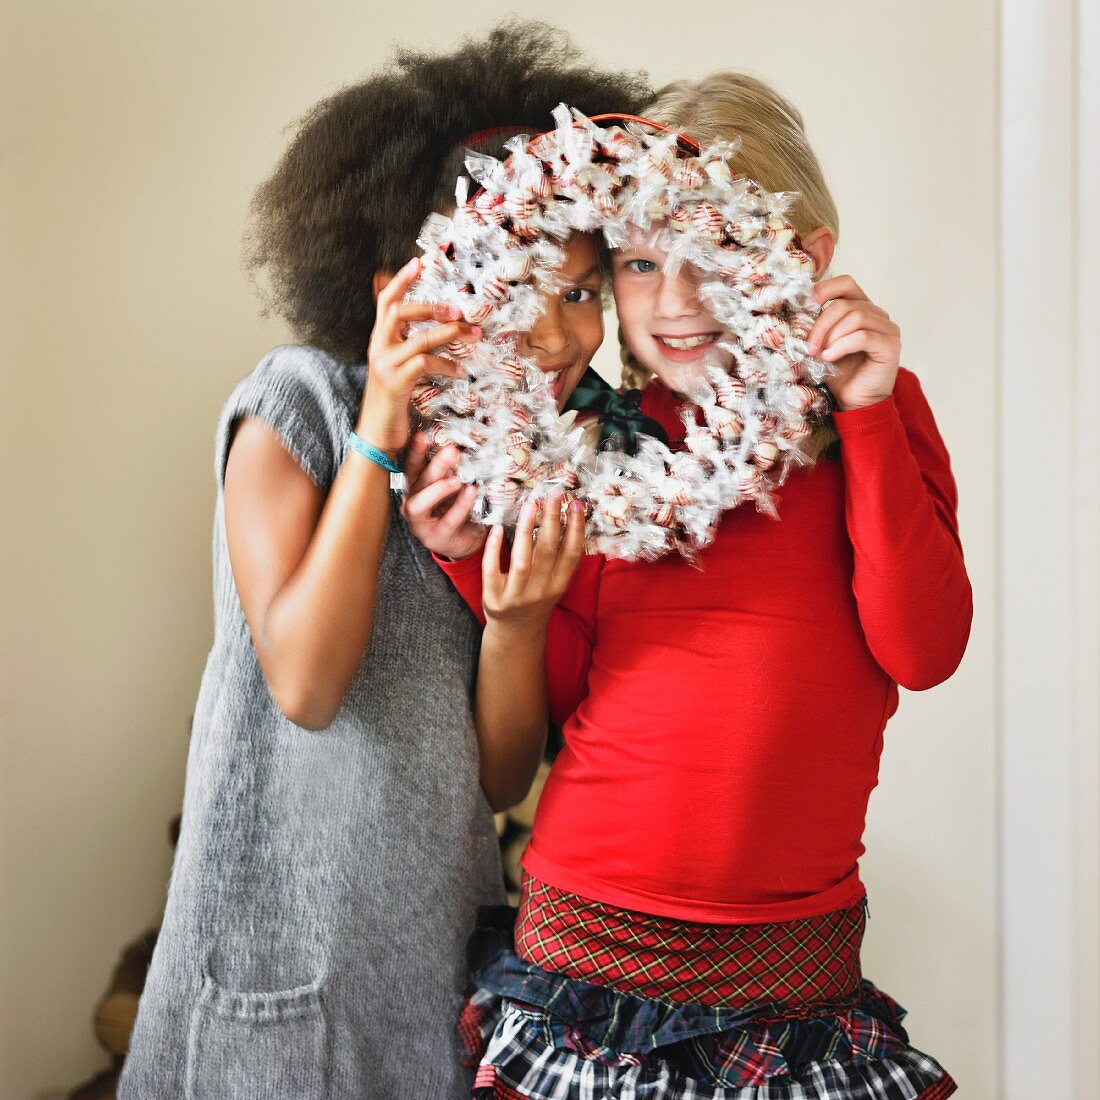 Girls looking through a Christmas wreath